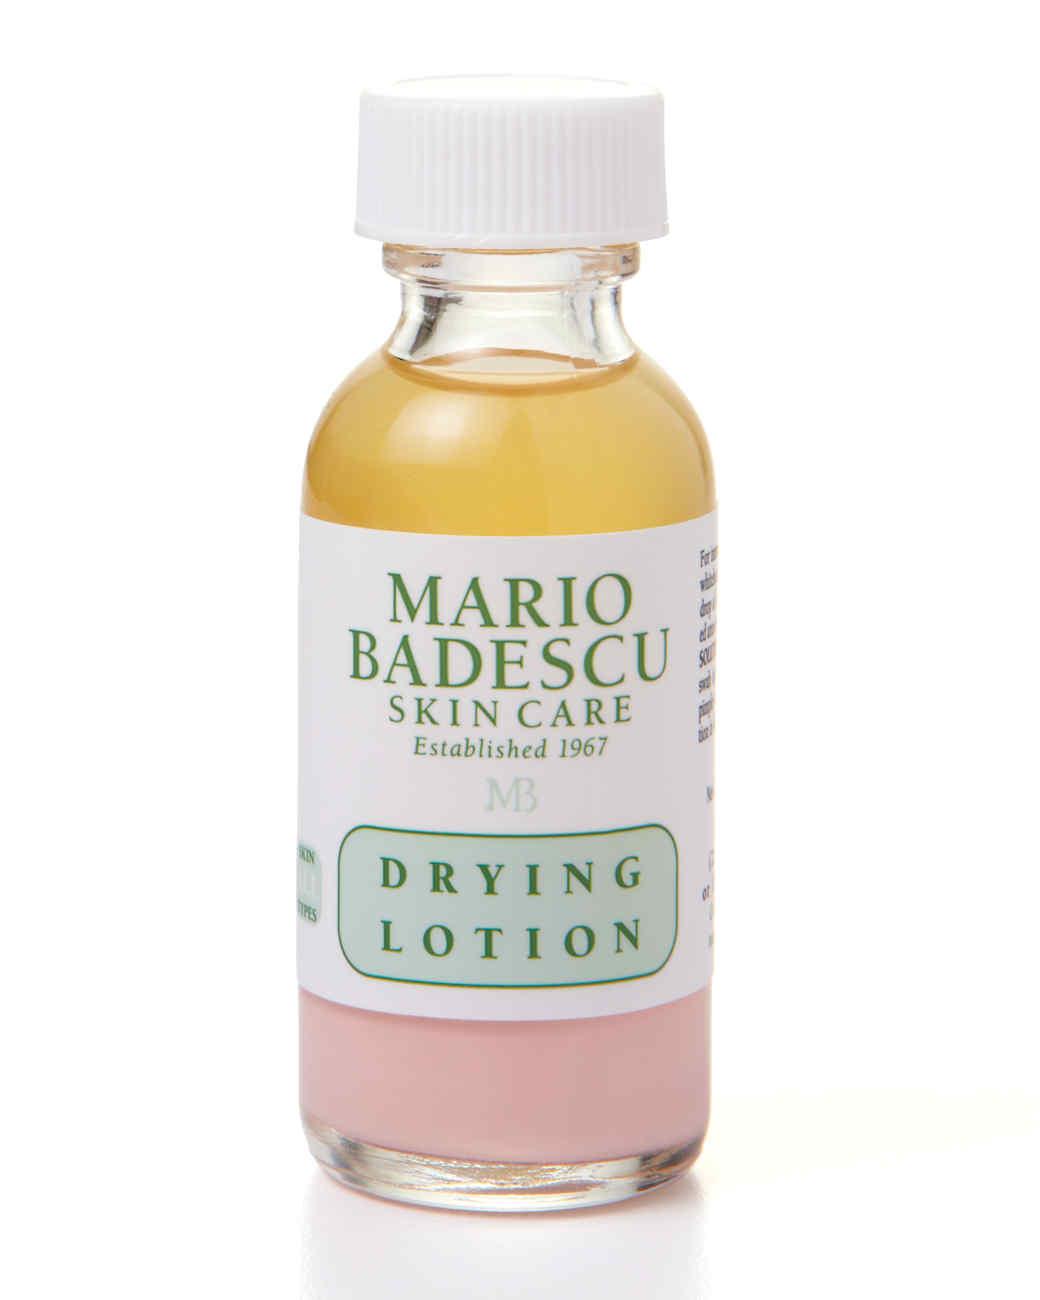 drying-lotion-229-mld110351.jpg